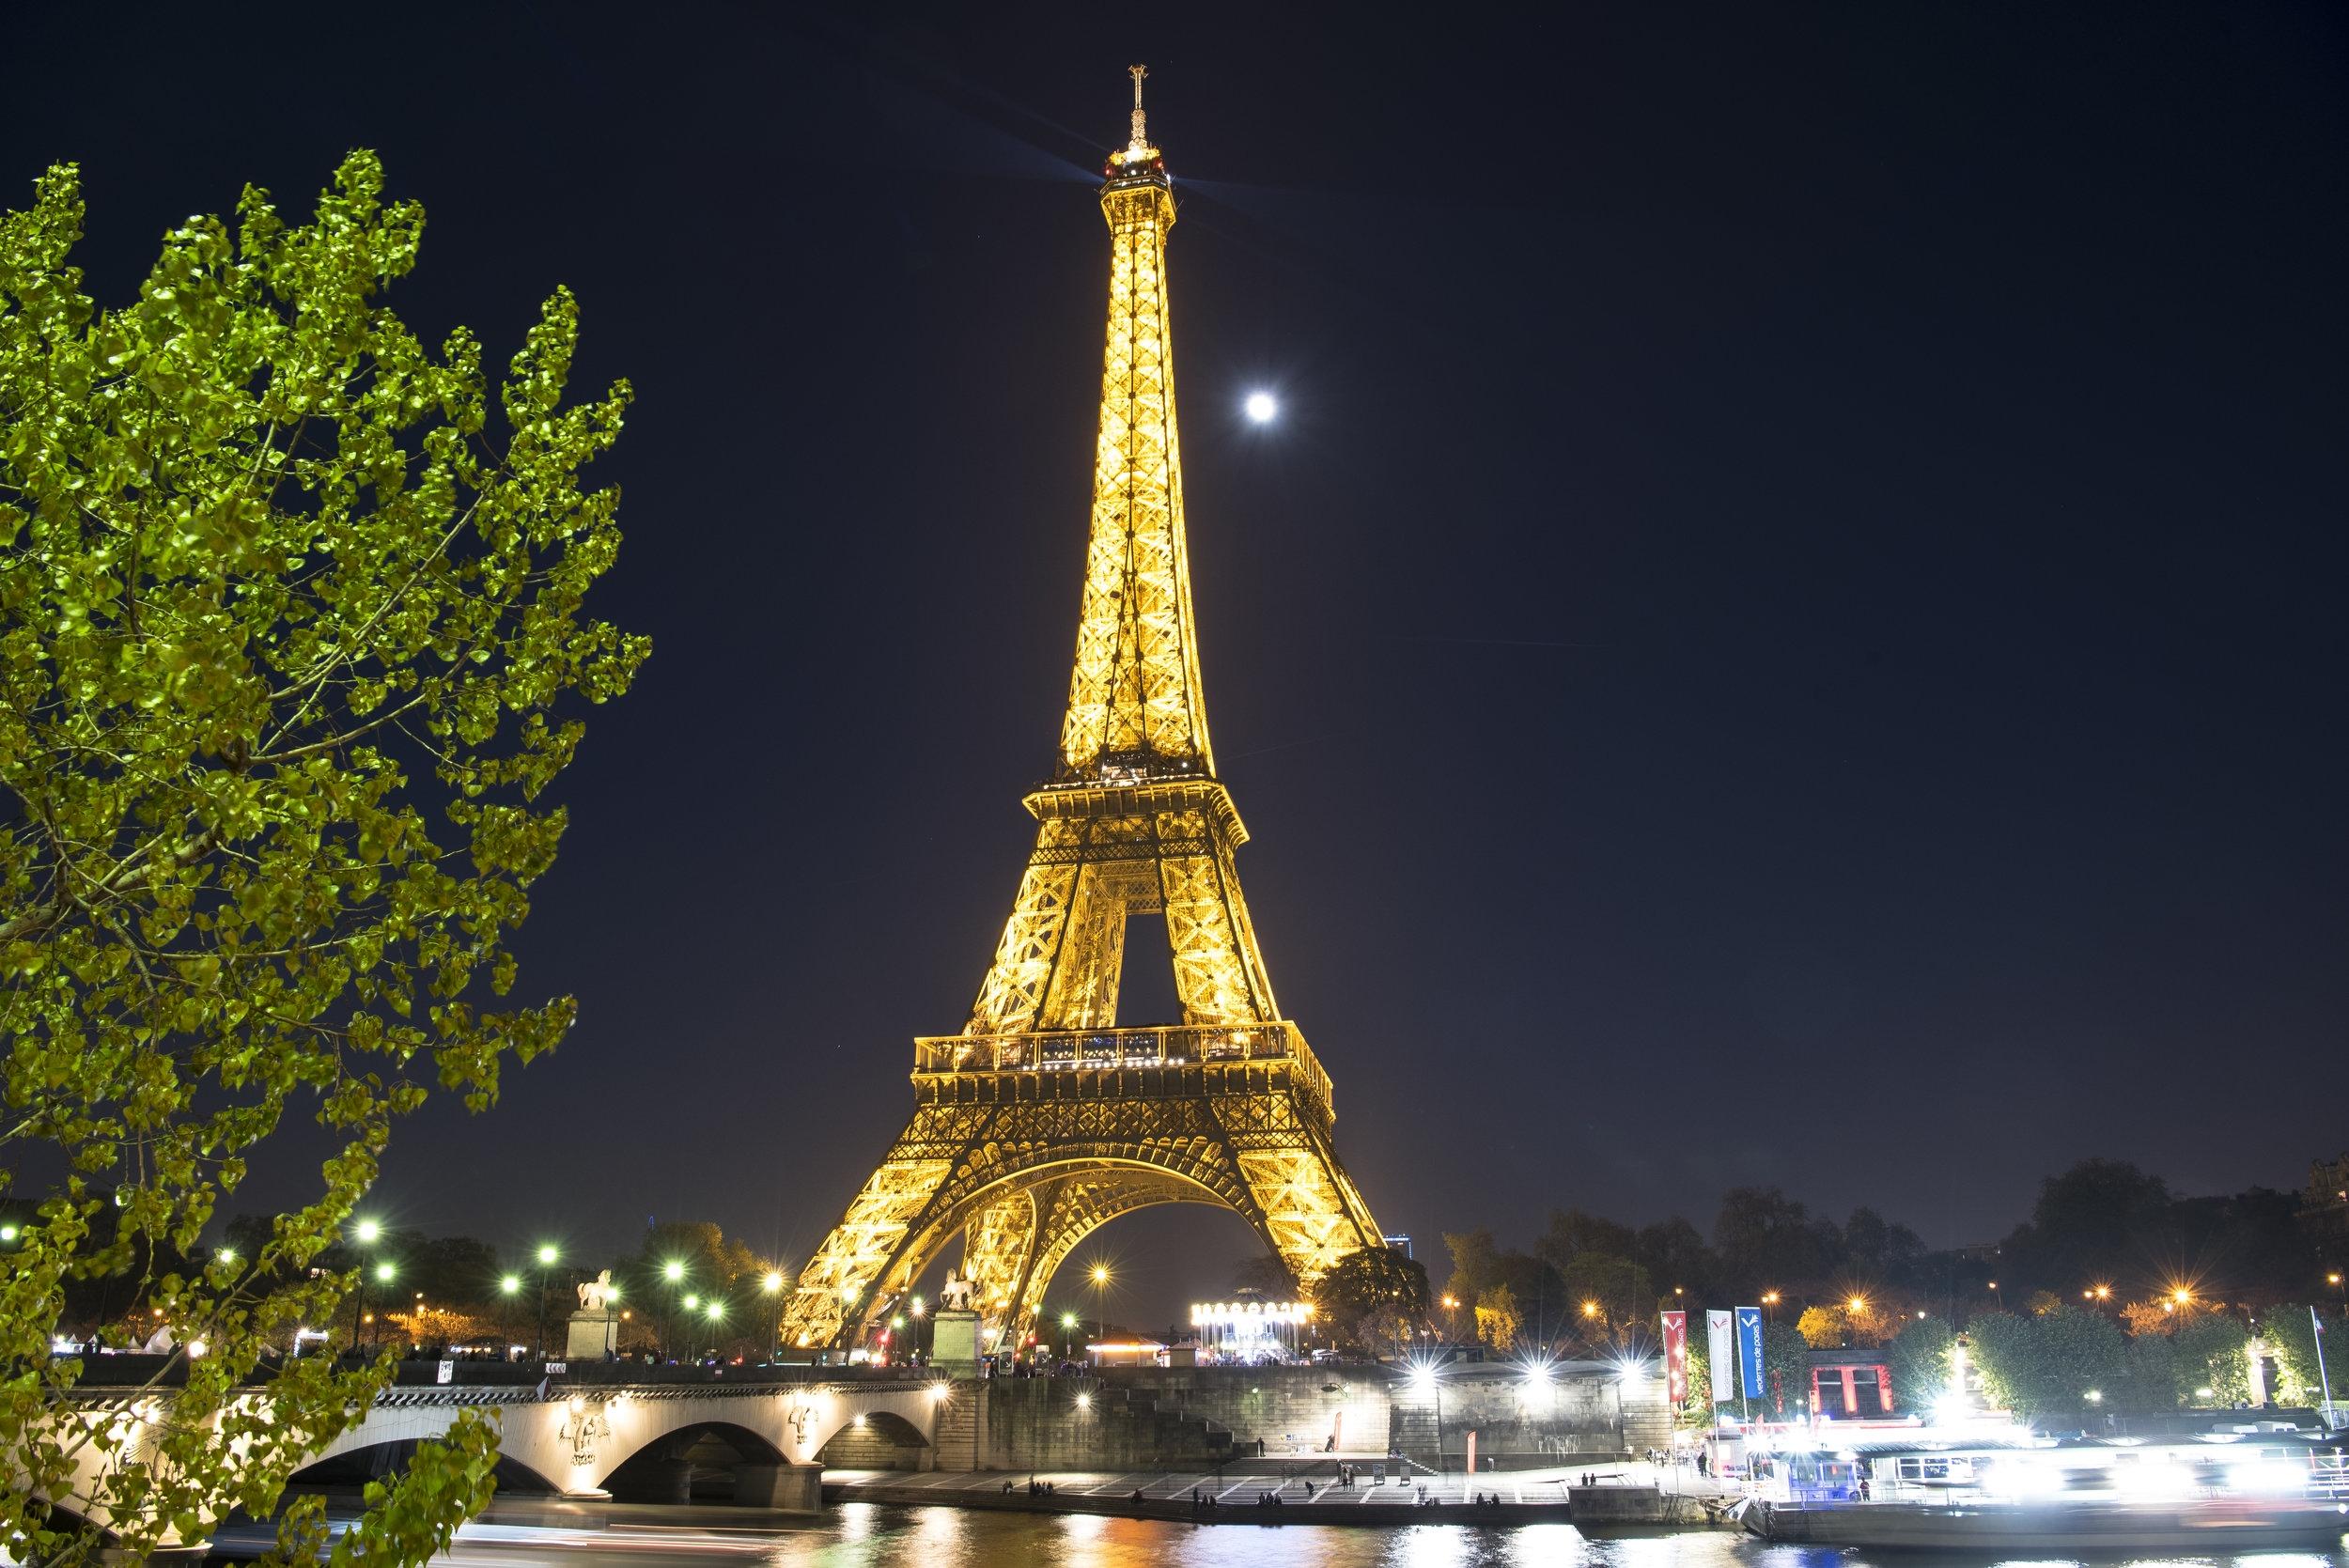 Paris Nights - Eiffel Tower (Paris, France)